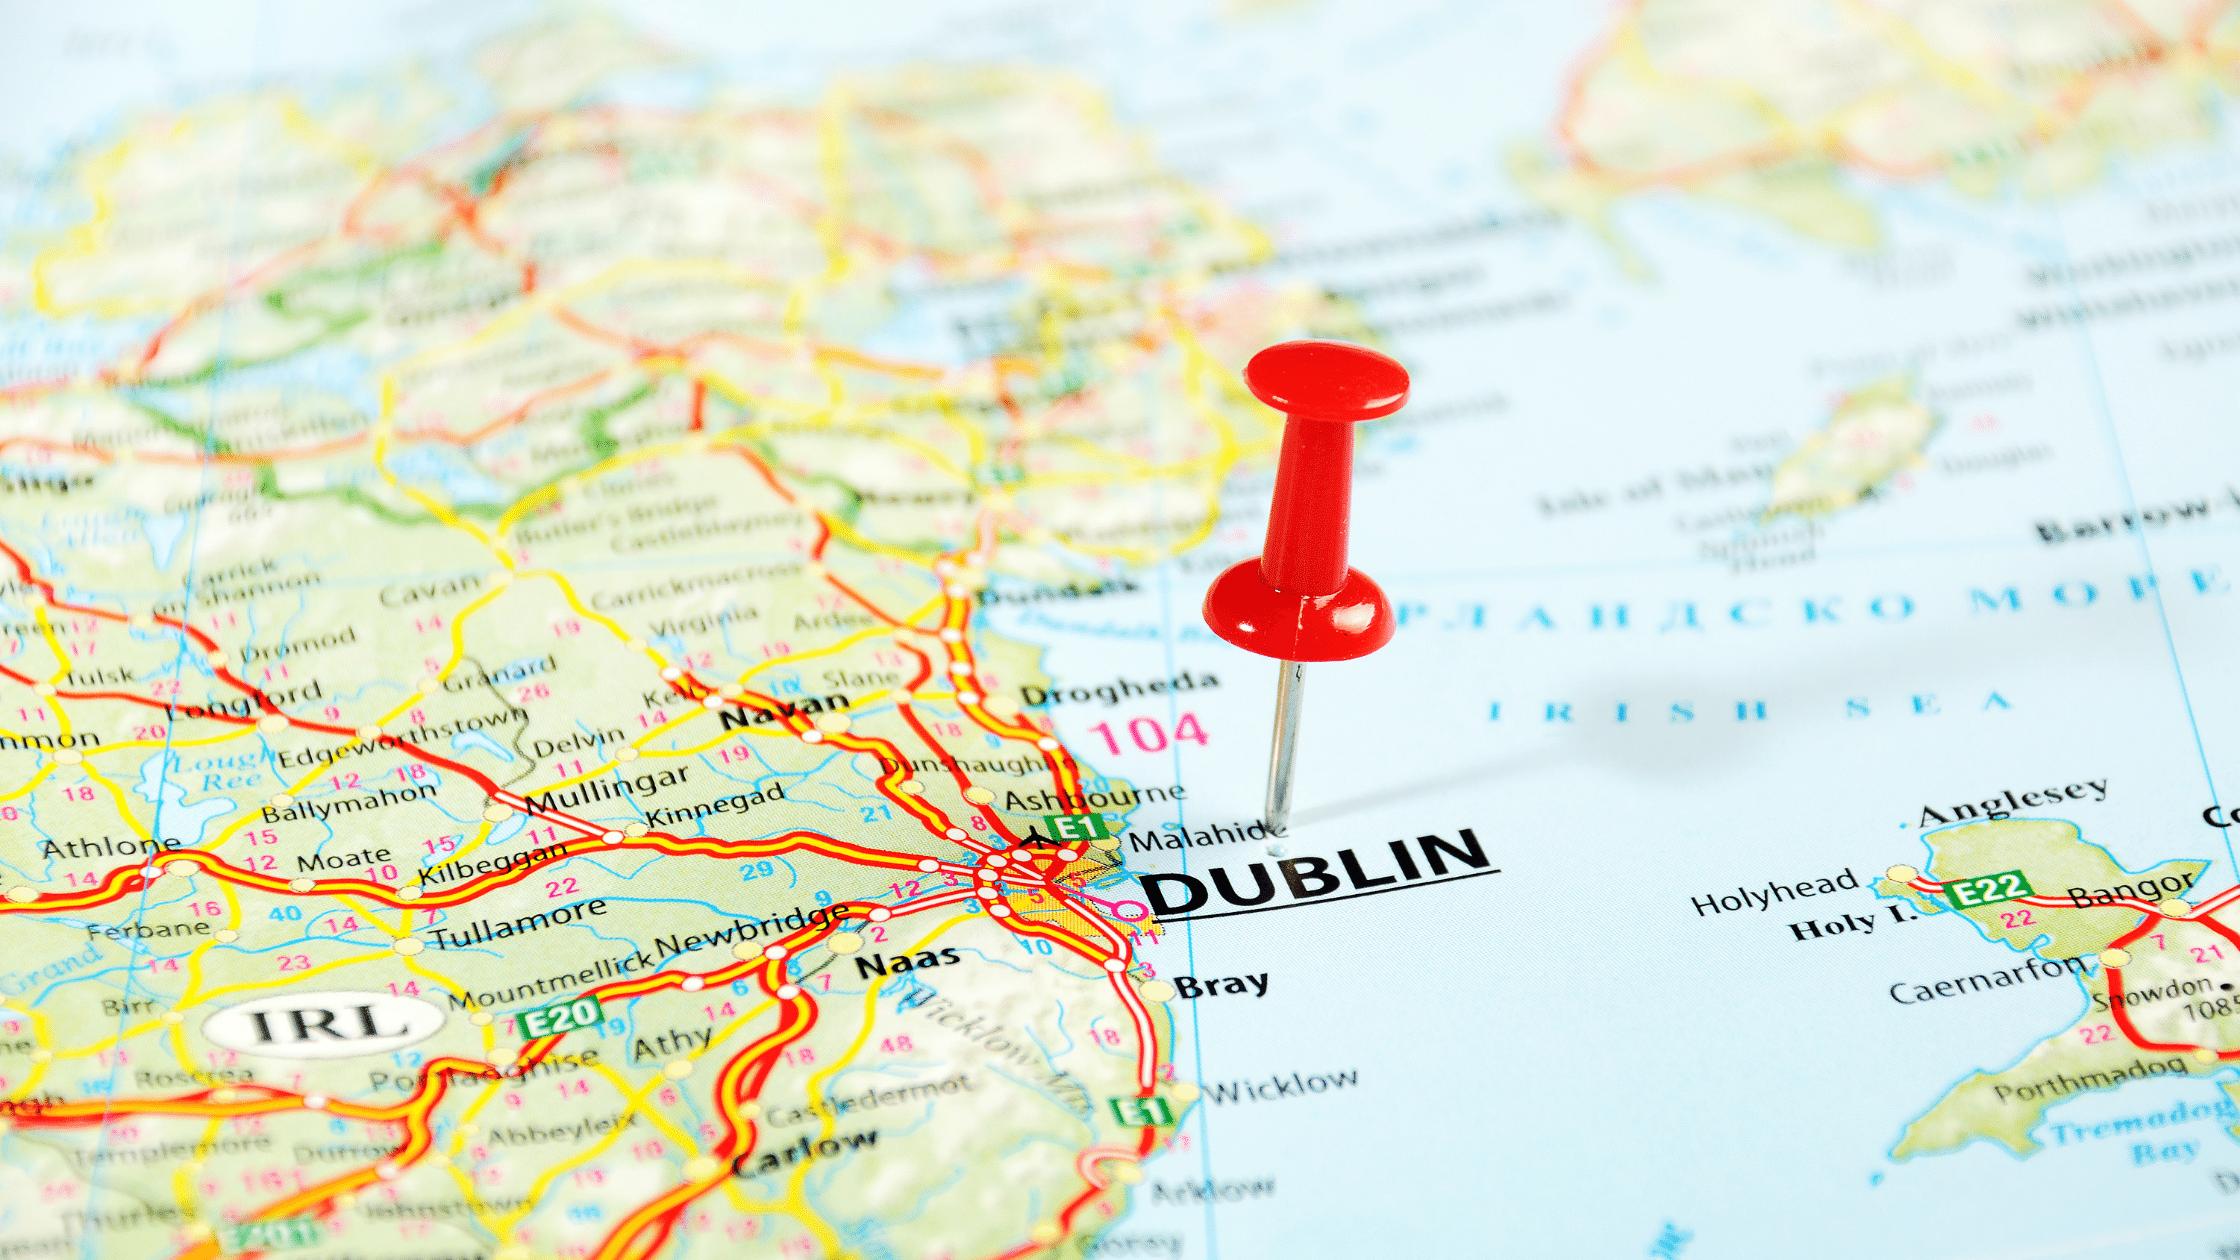 Day trip to Dublin City Ireland